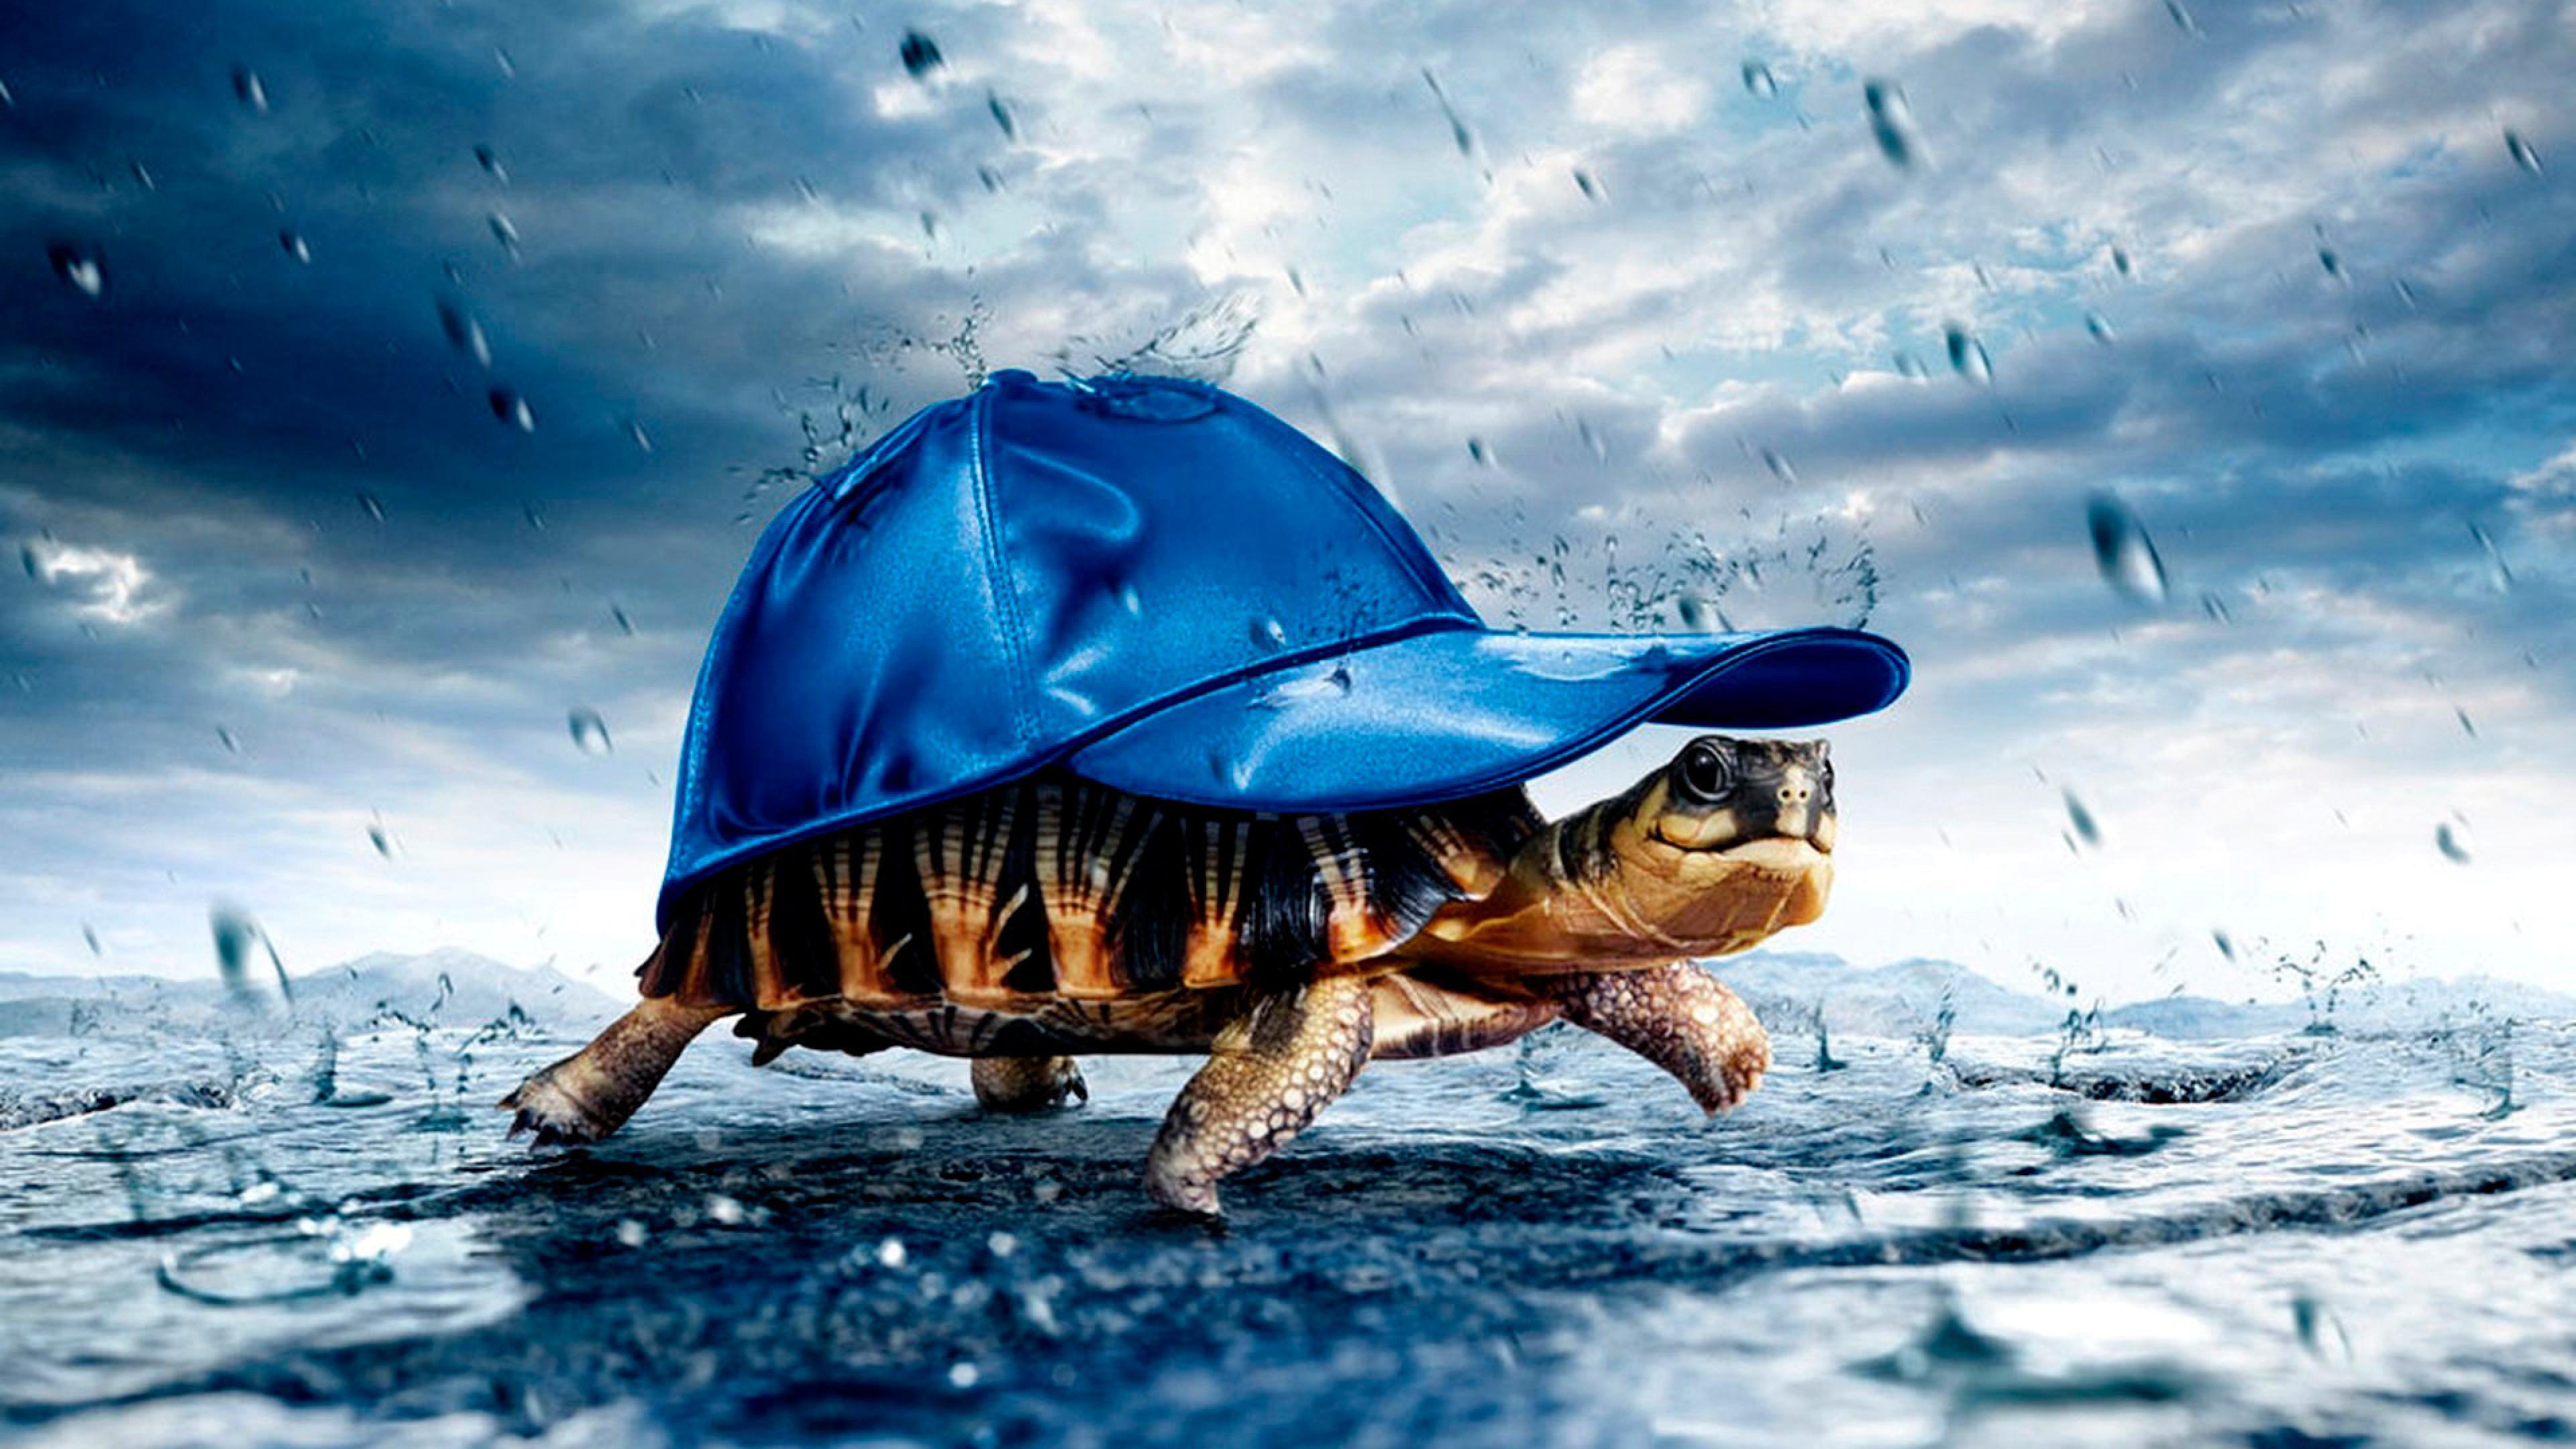 funny turtle 3d full hd wallpaper